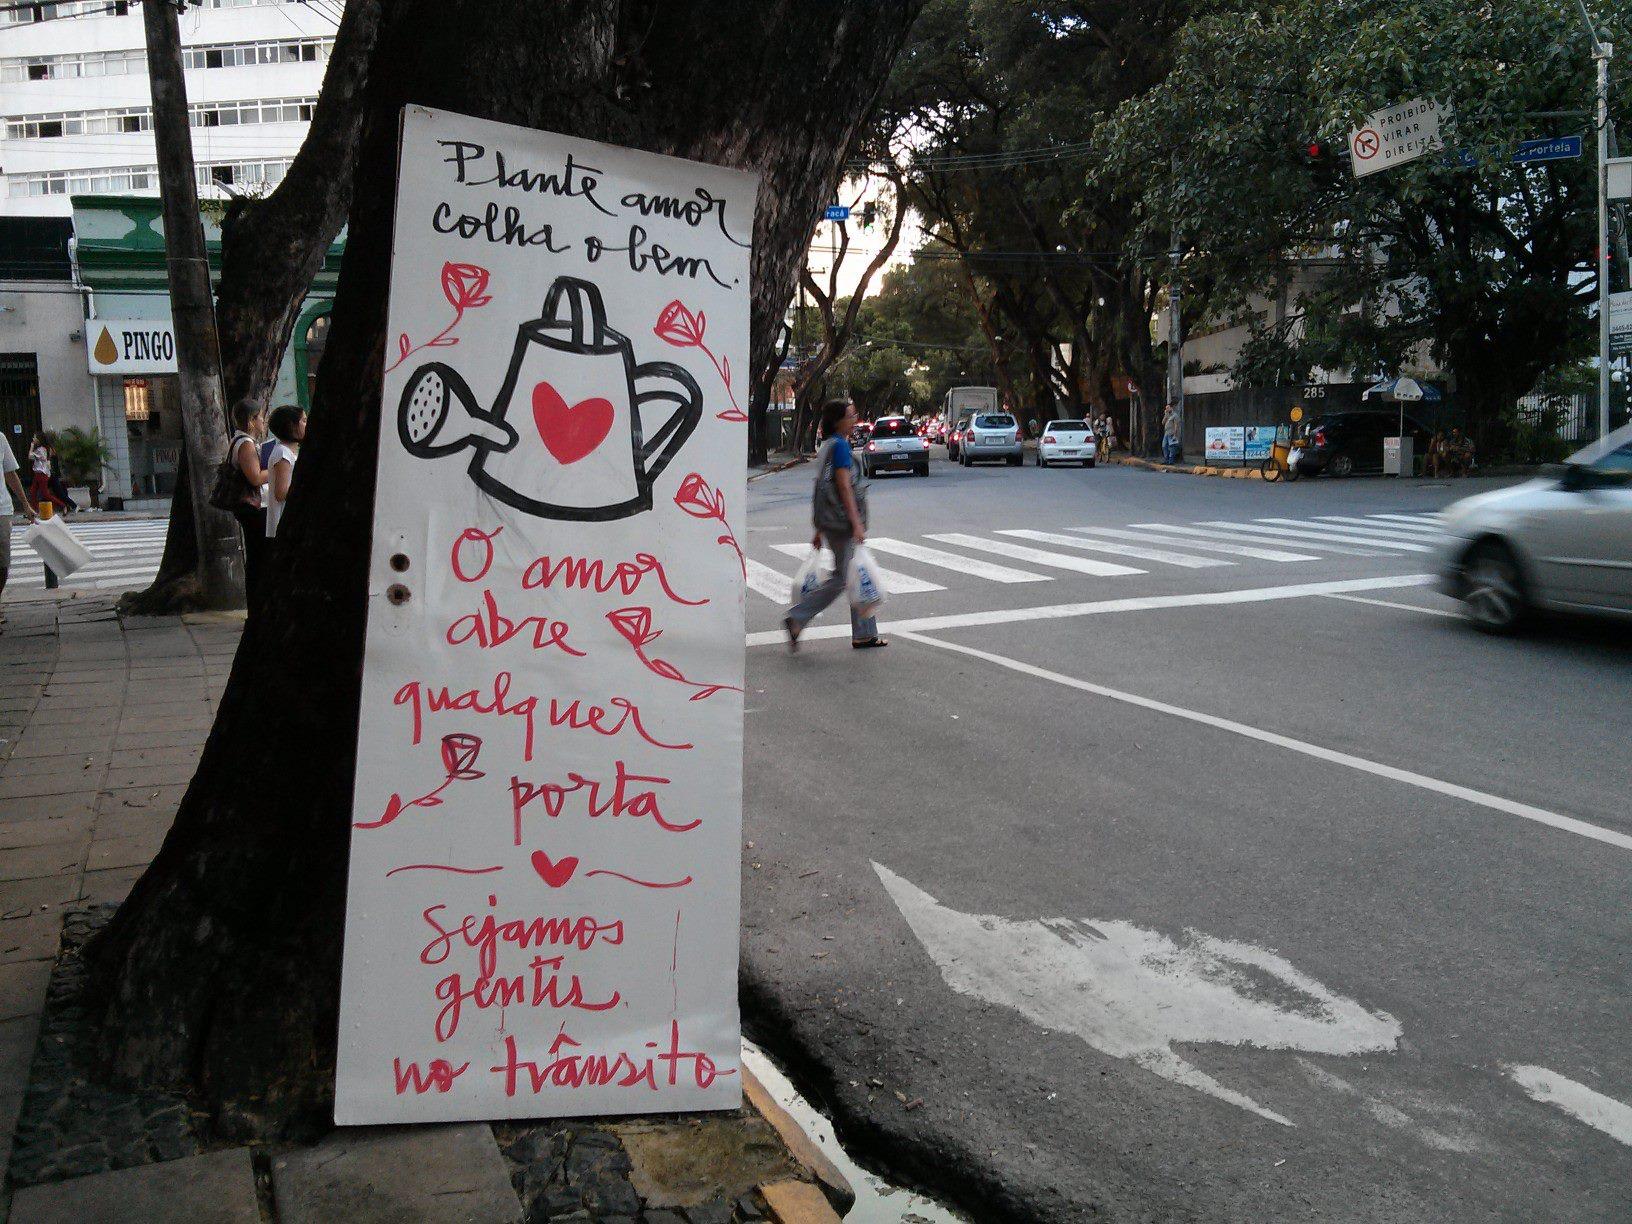 Plante_Amor_Gabriel_Çarungaua